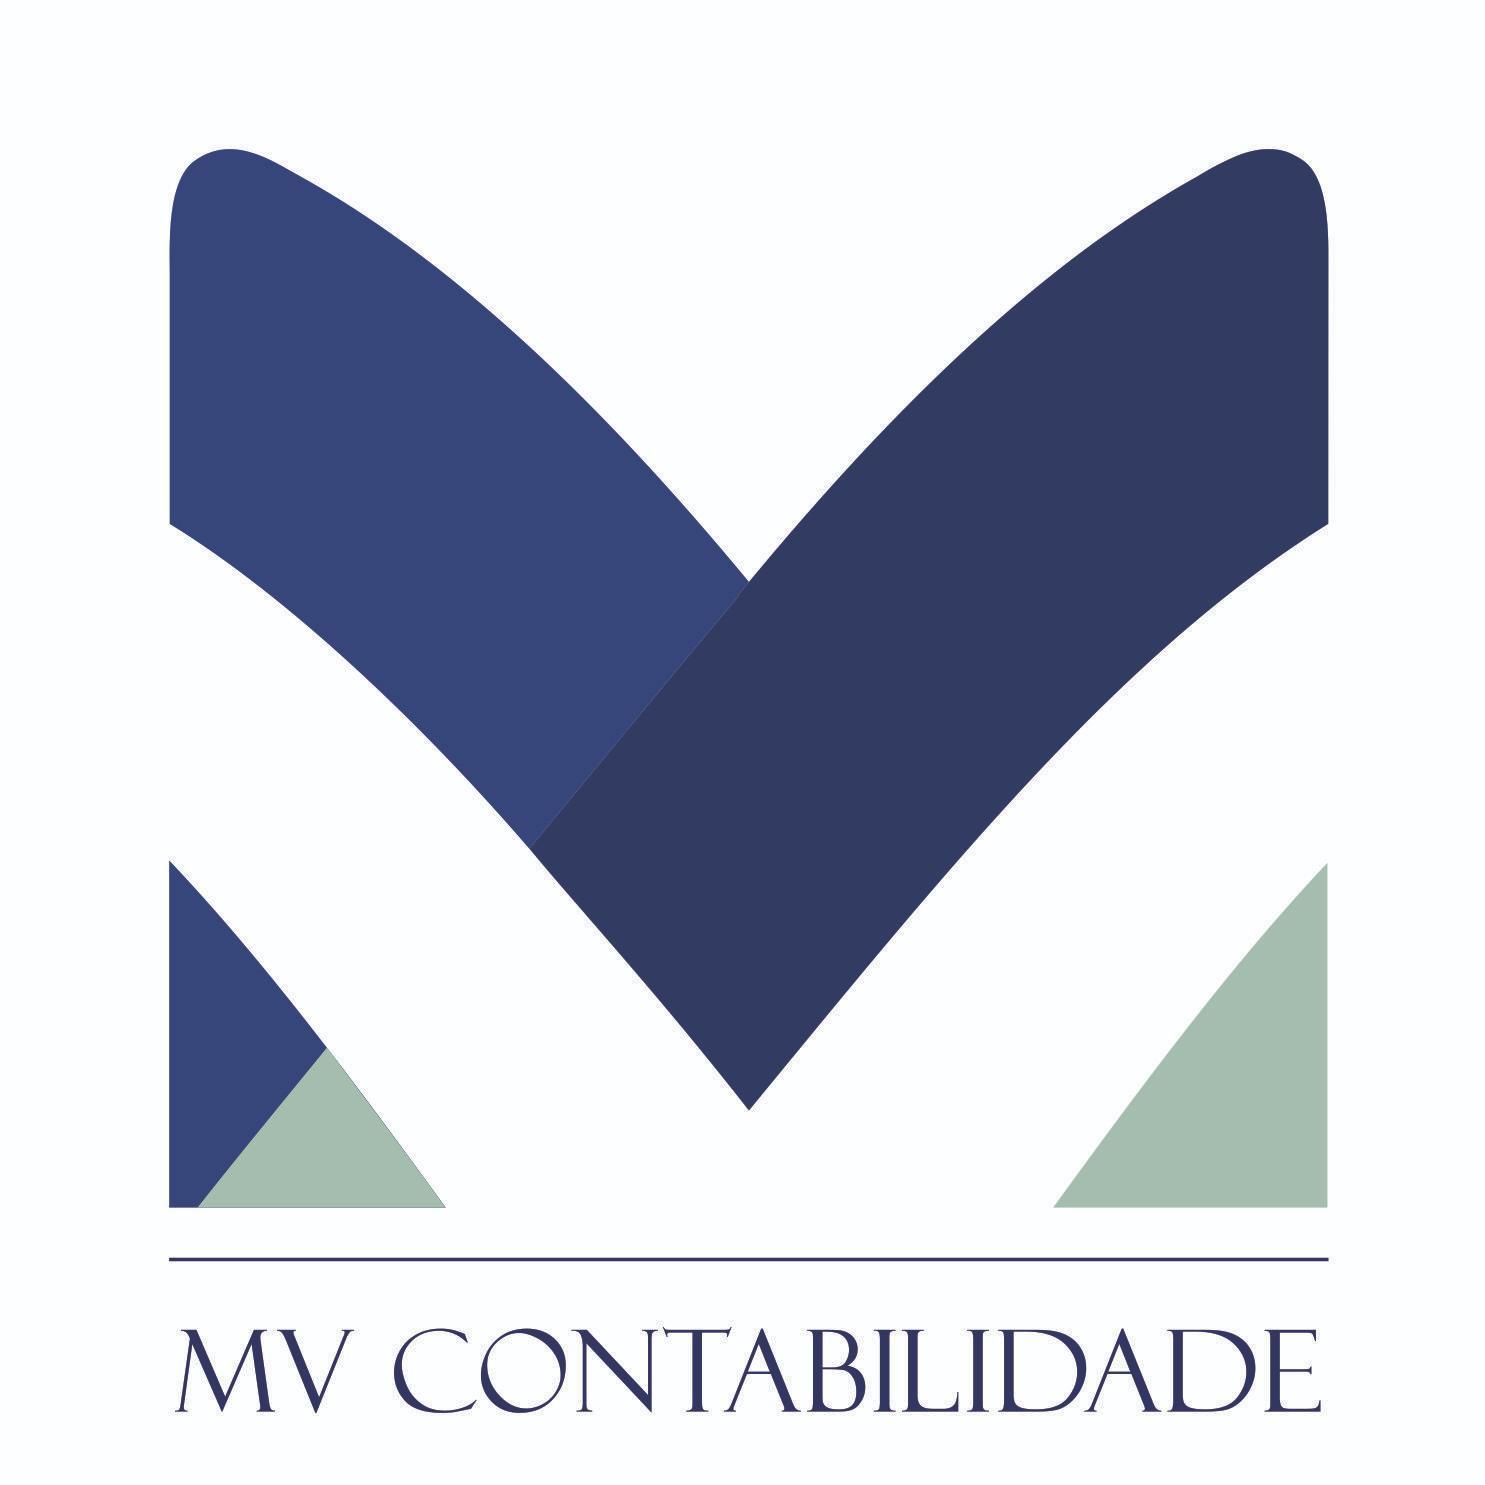 Mv Contabilidade